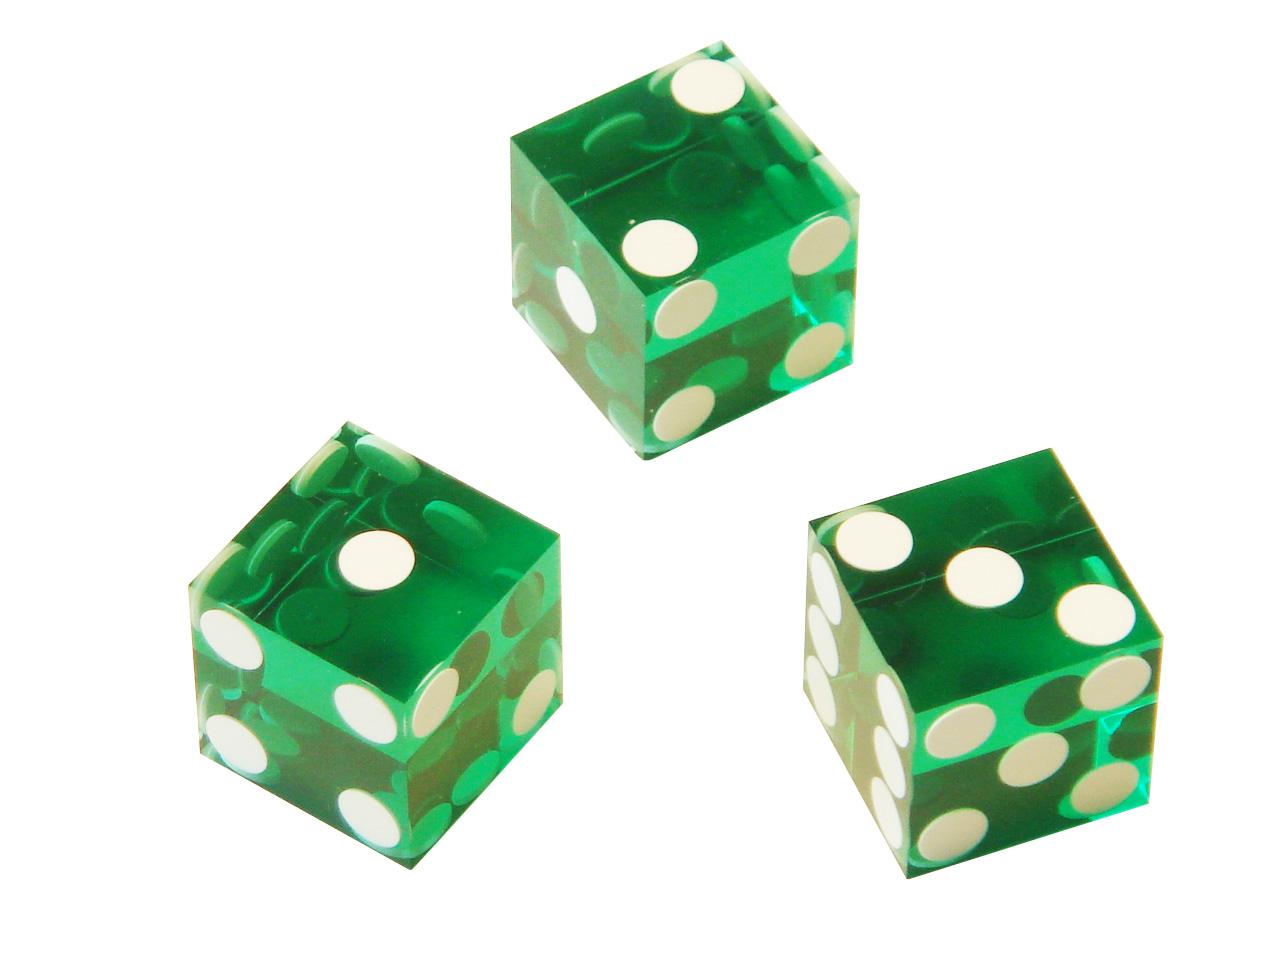 spielzeug mehr casino w rfel standard 19 3 mm gr n. Black Bedroom Furniture Sets. Home Design Ideas